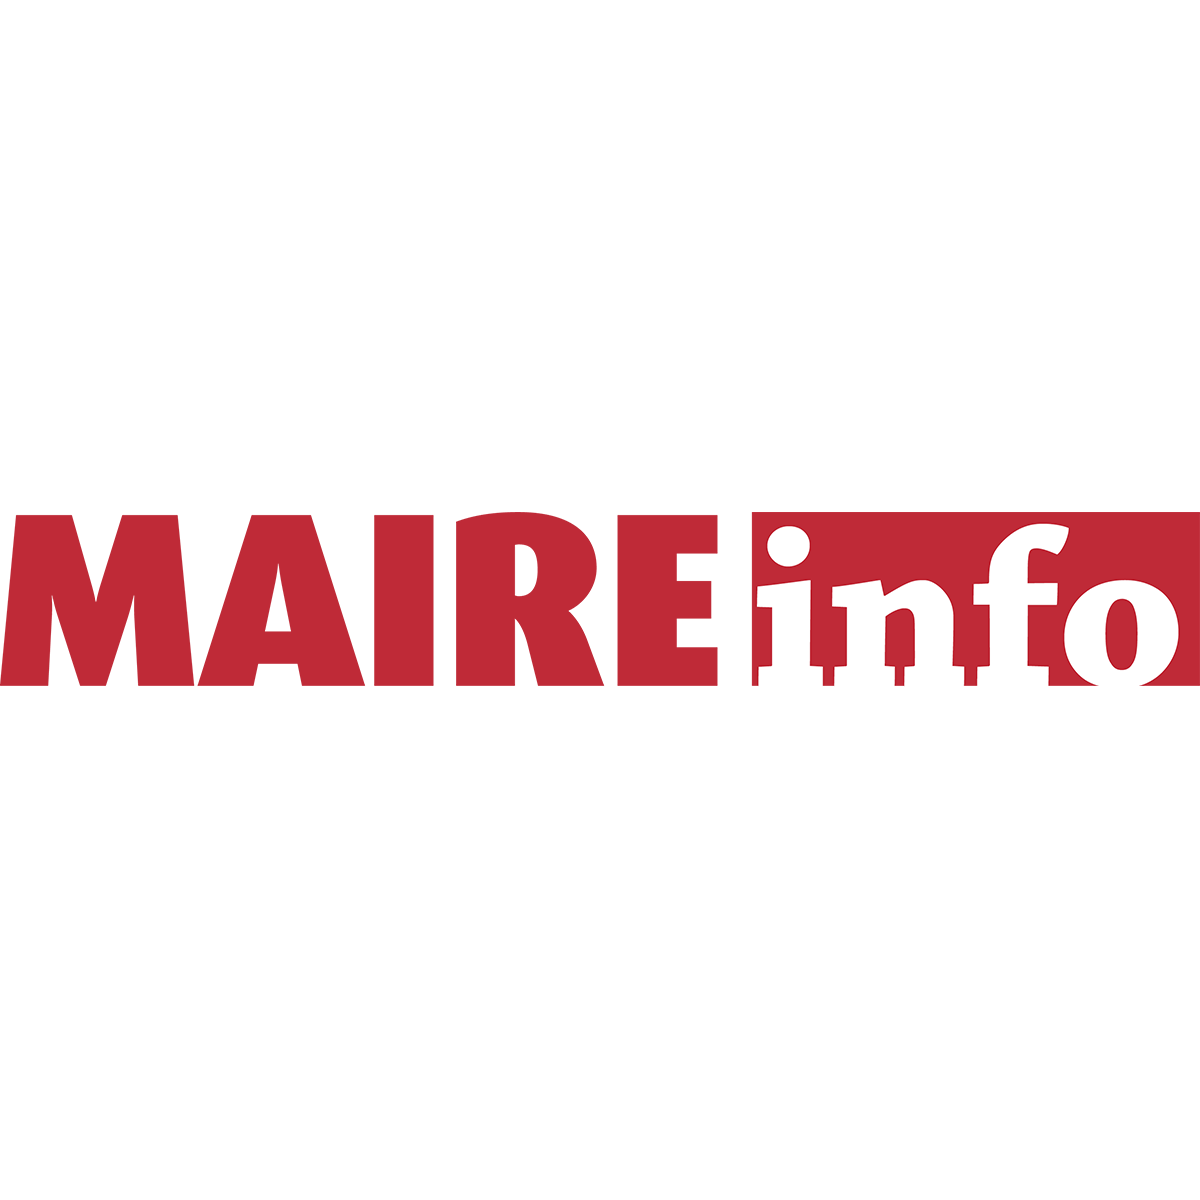 logo-maireinfofb.png